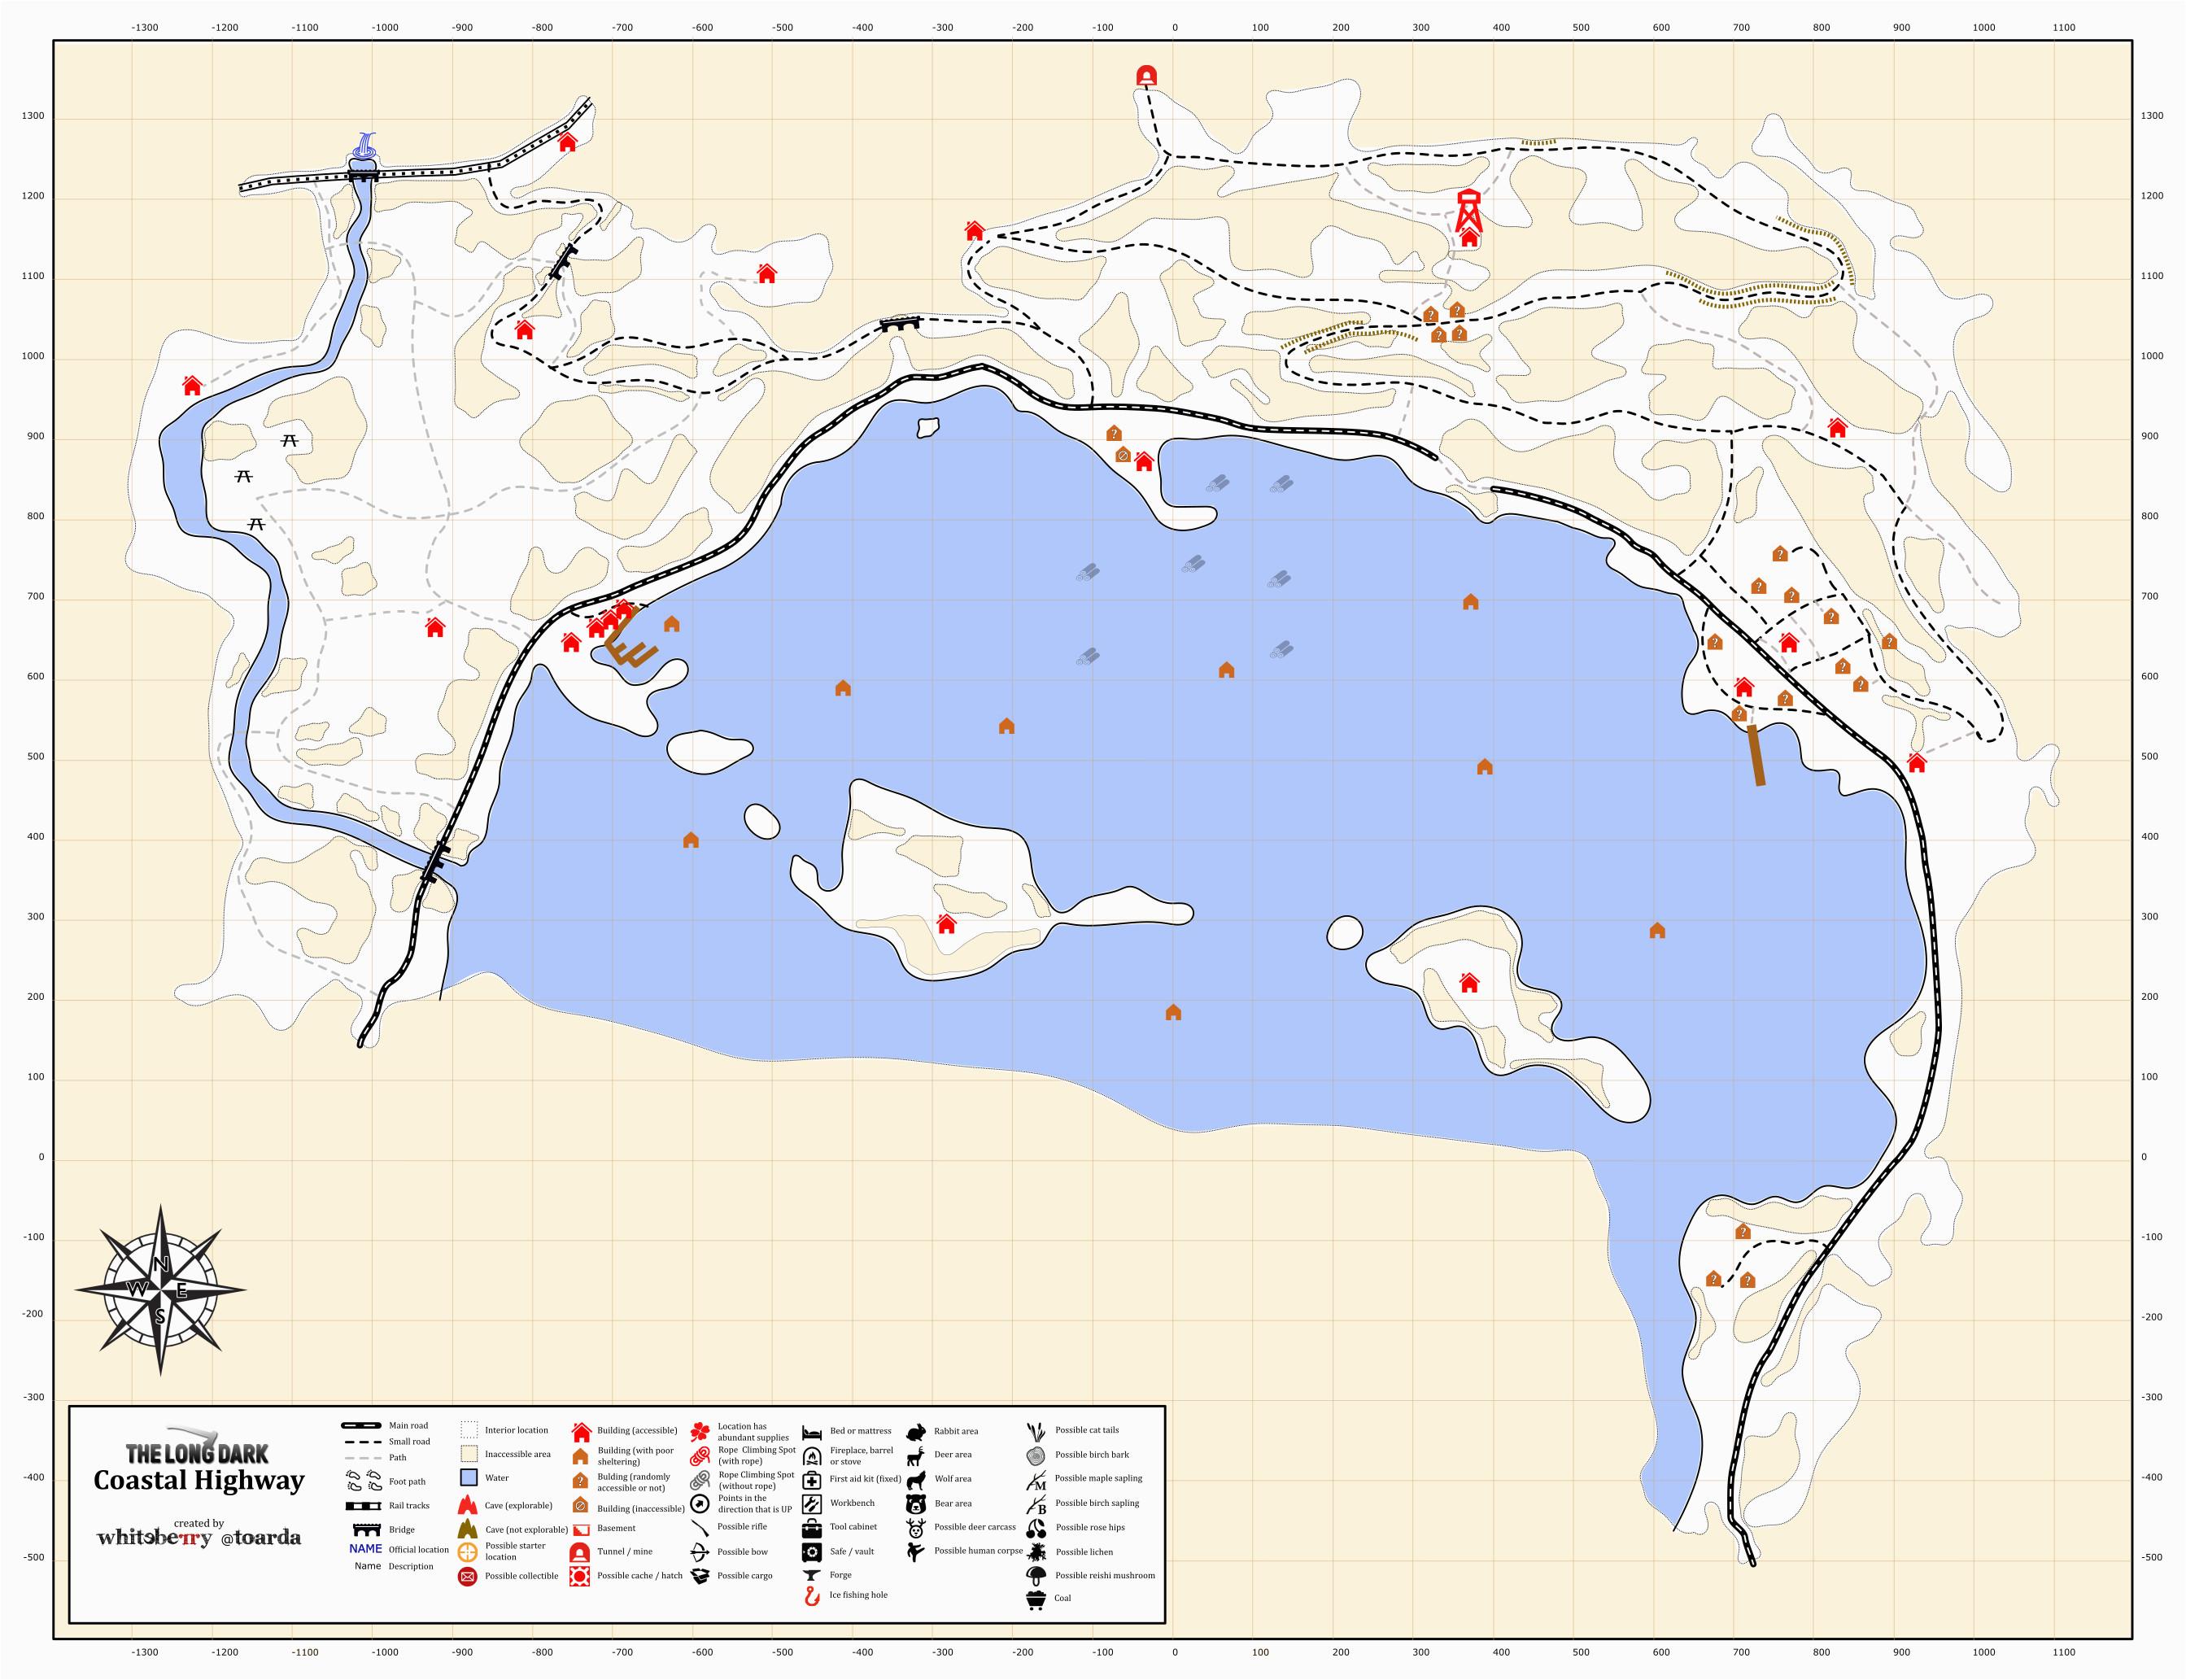 coastal highway map awesome california coast road trip map free